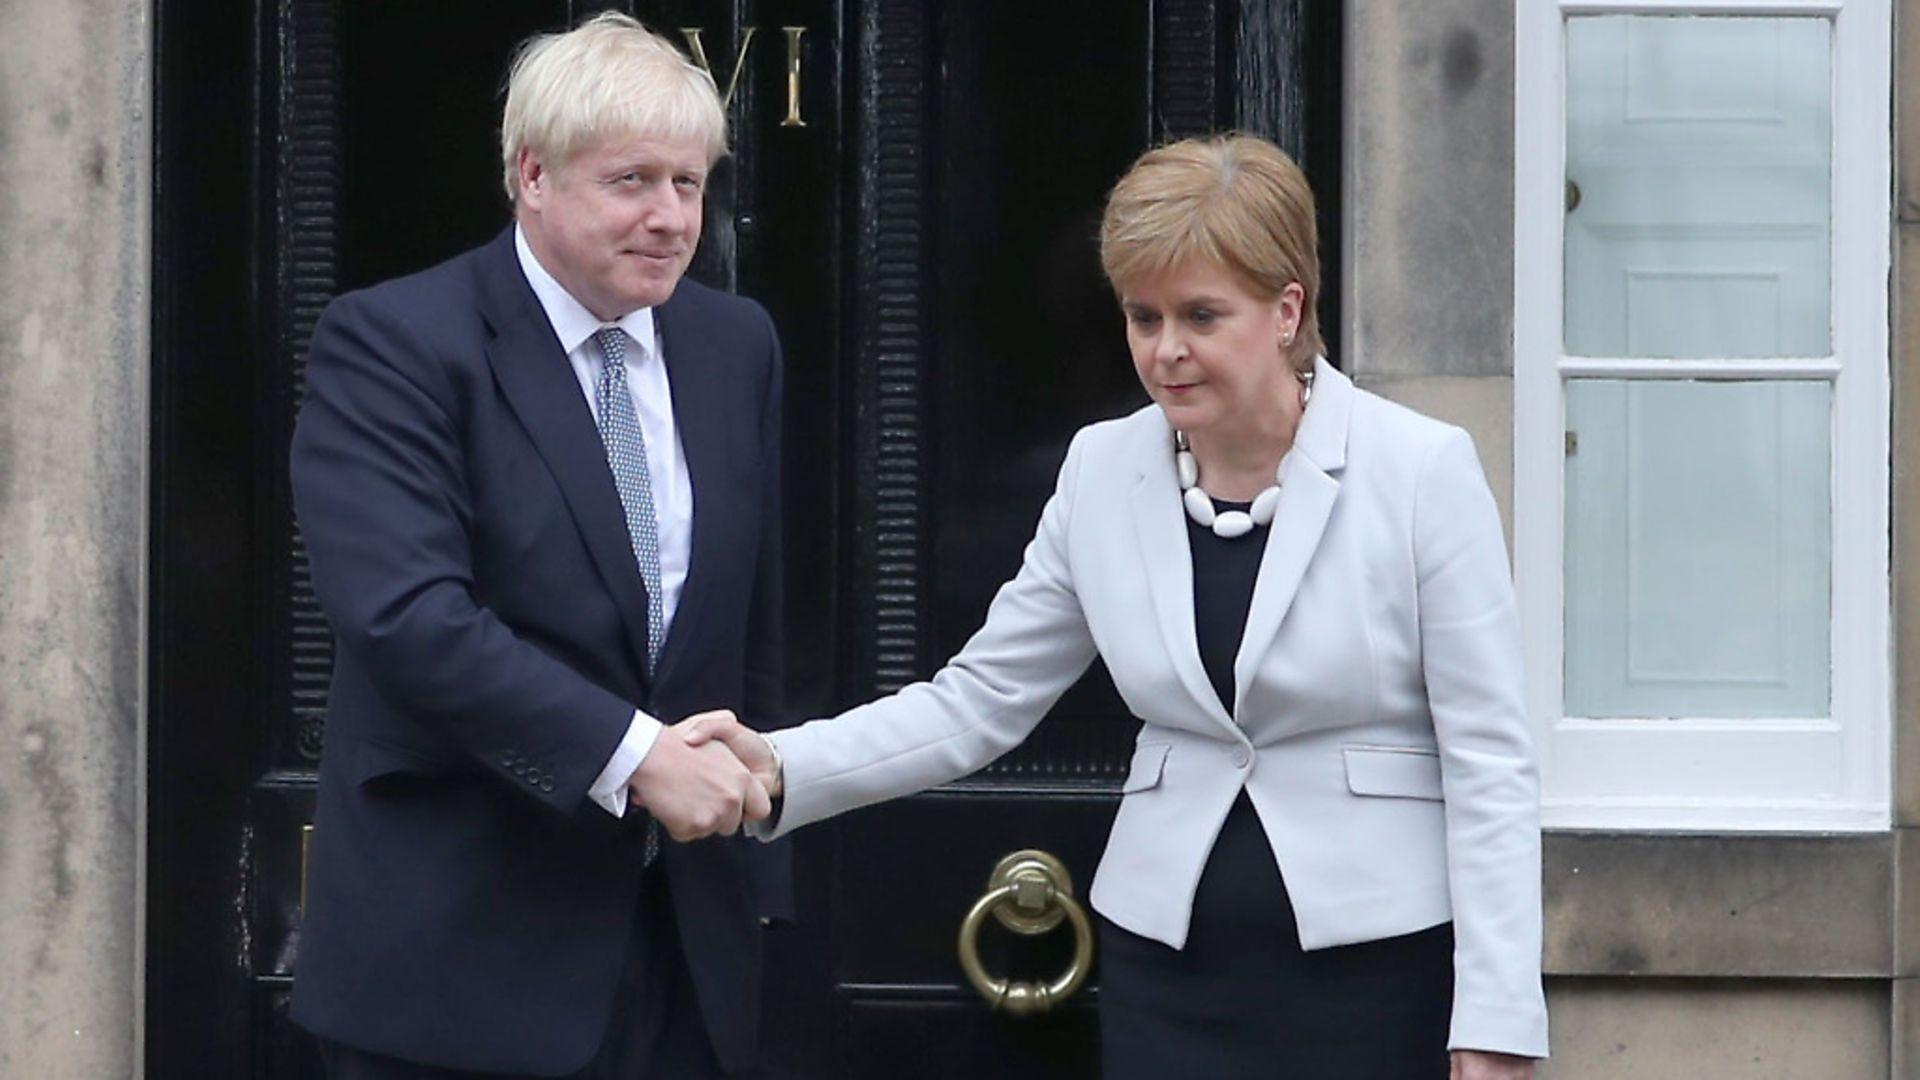 Scotland's first minister Nicola Sturgeon with prime minister prime minister Boris Johnson outside Bute House in Edinburgh. Photograph: Jane Barlow/PA. - Credit: PA